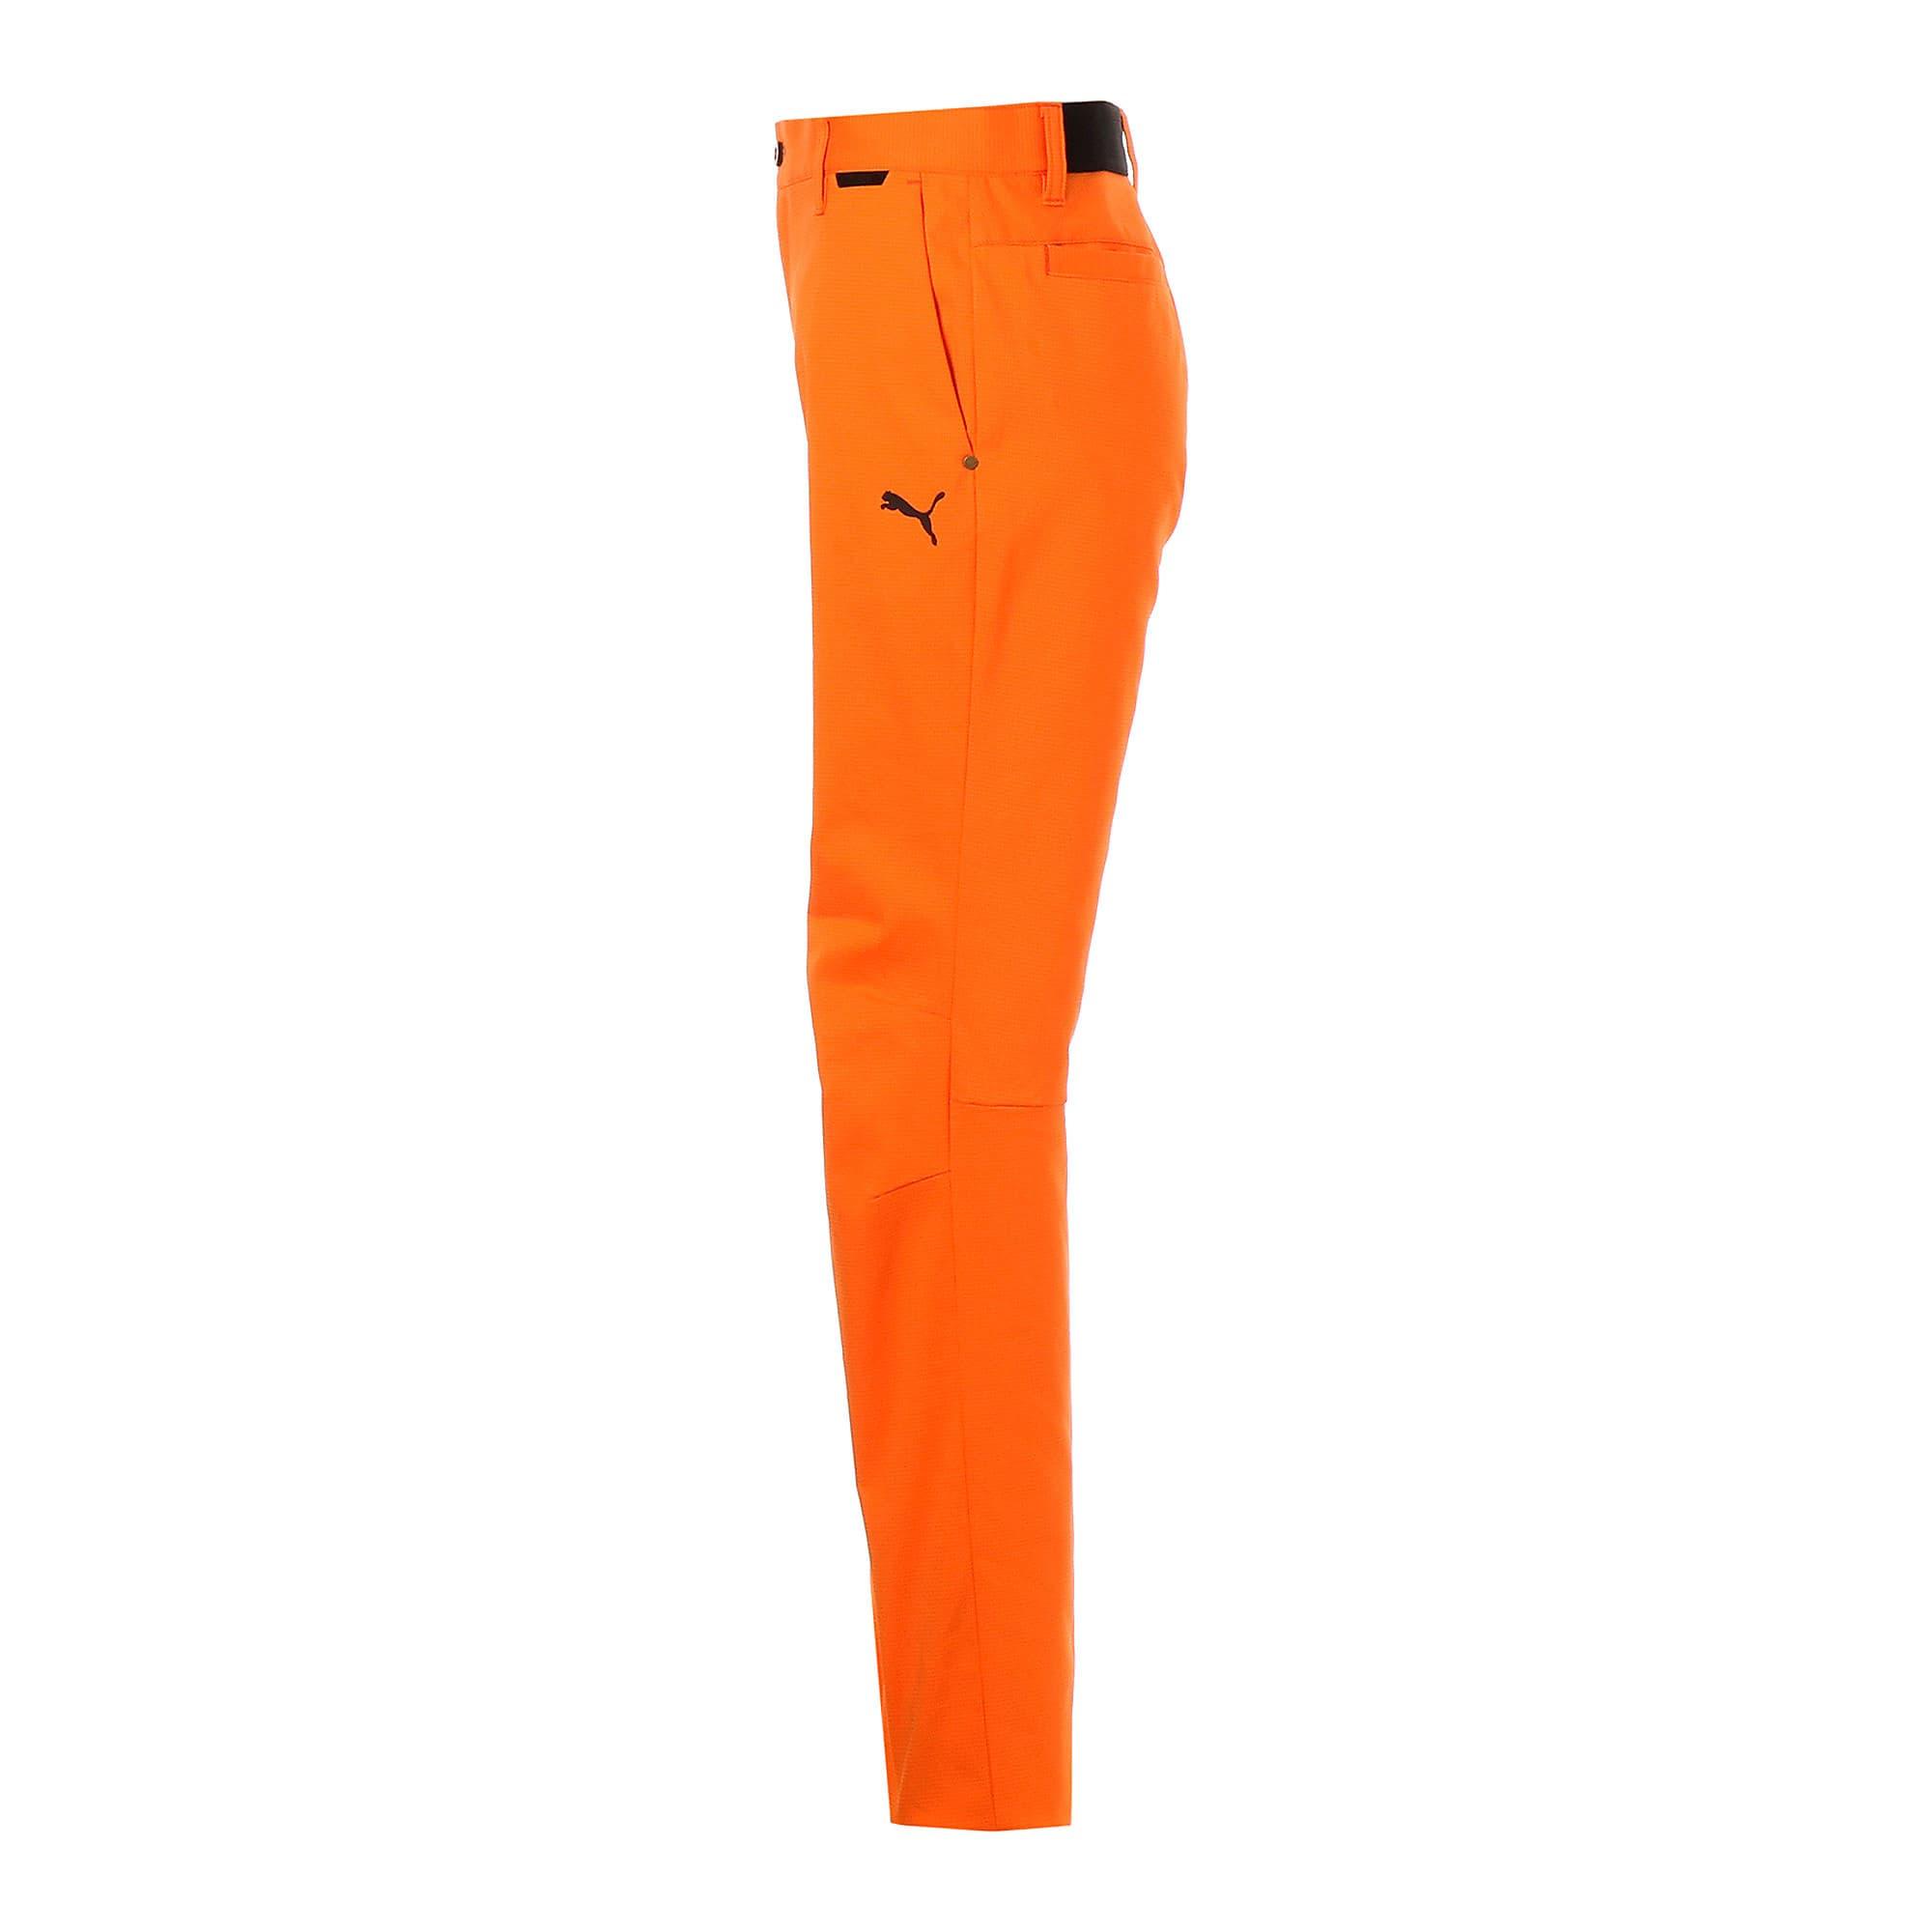 Thumbnail 2 of ゴルフ フュージョン 3Dテーパードパンツ, Vibrant Orange, medium-JPN